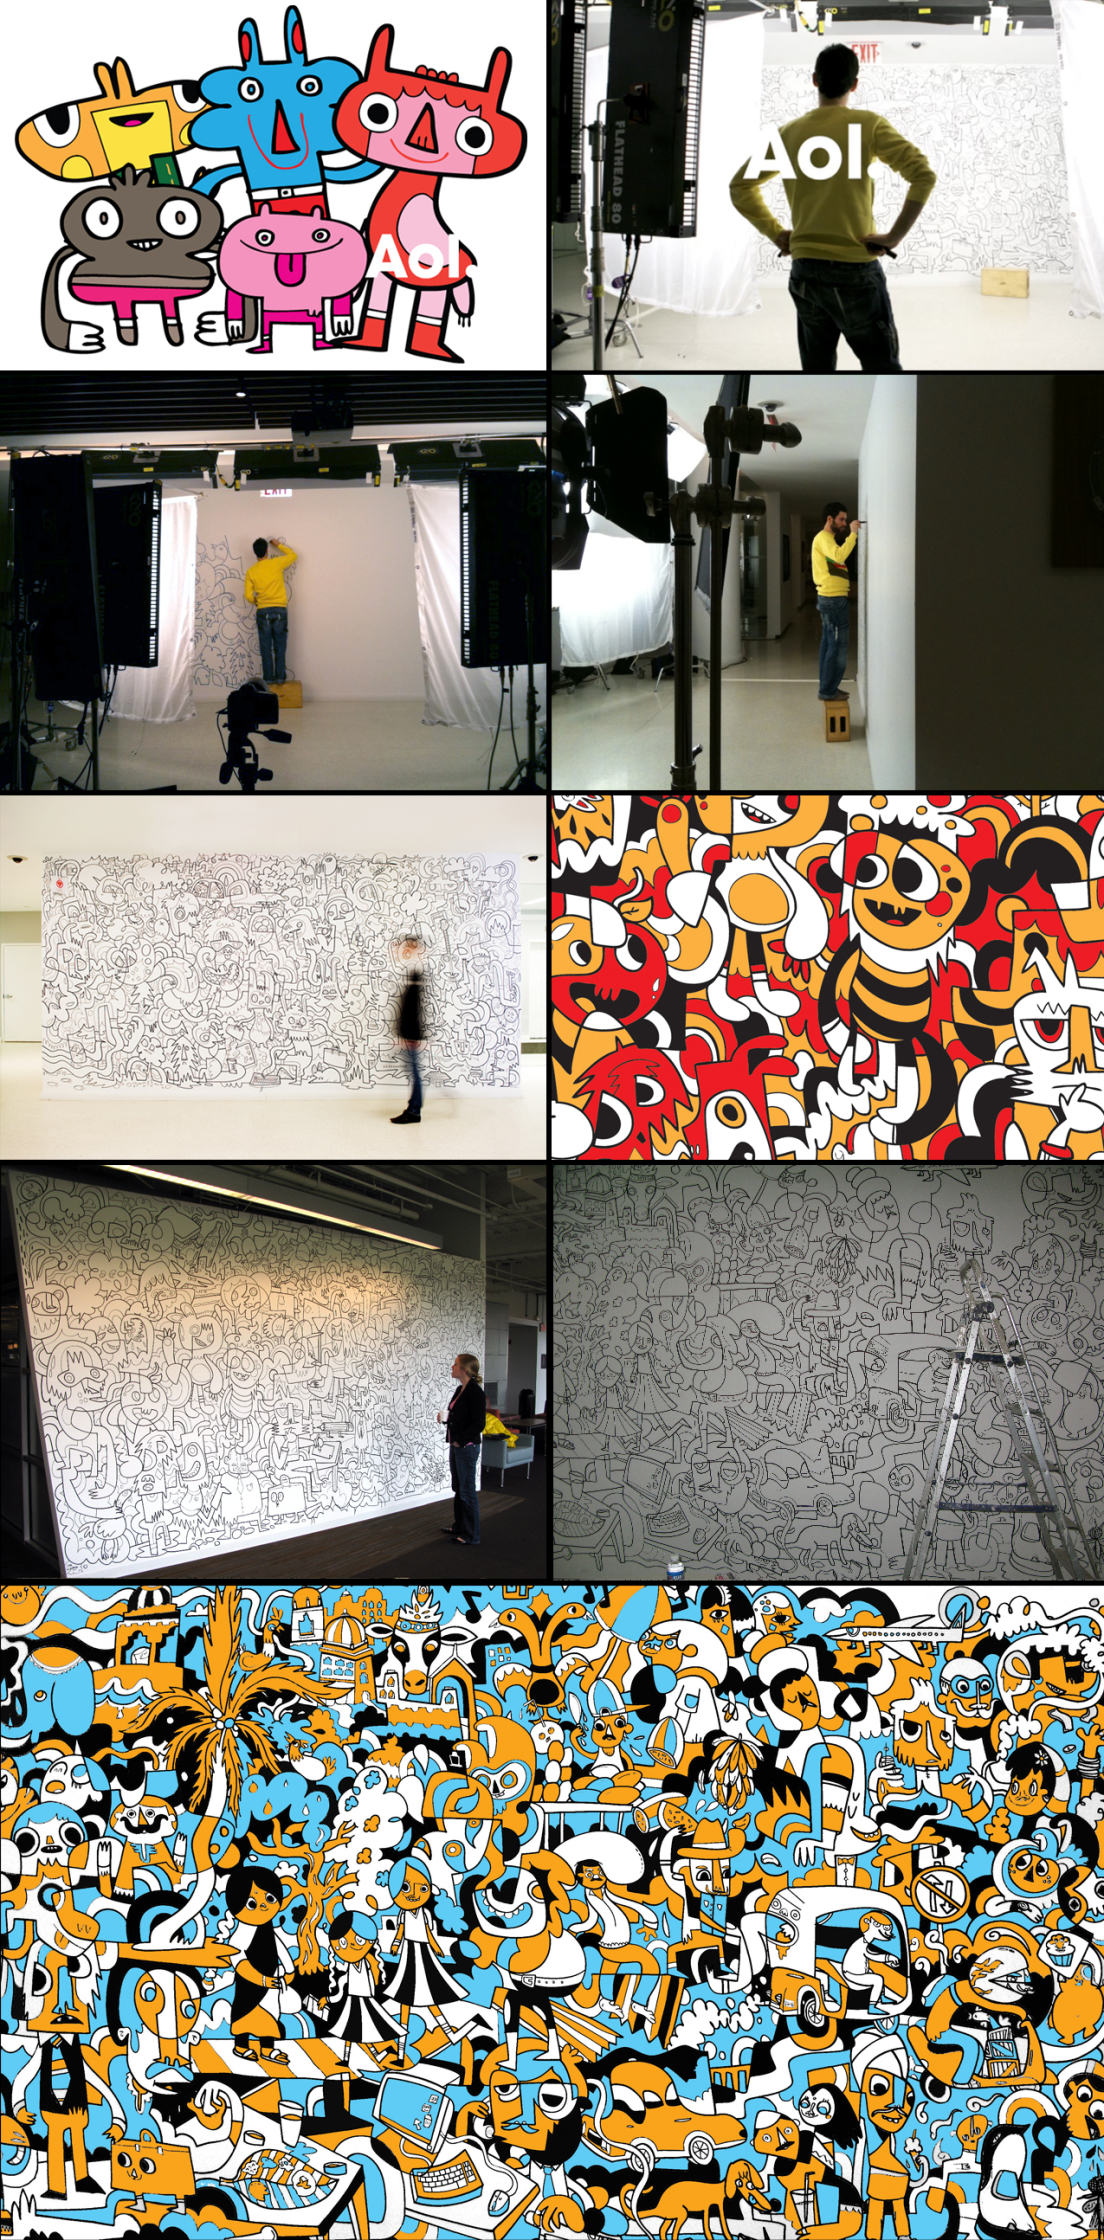 Jon Burgerman / Aol. Murals In New York, Washington + Bangalore